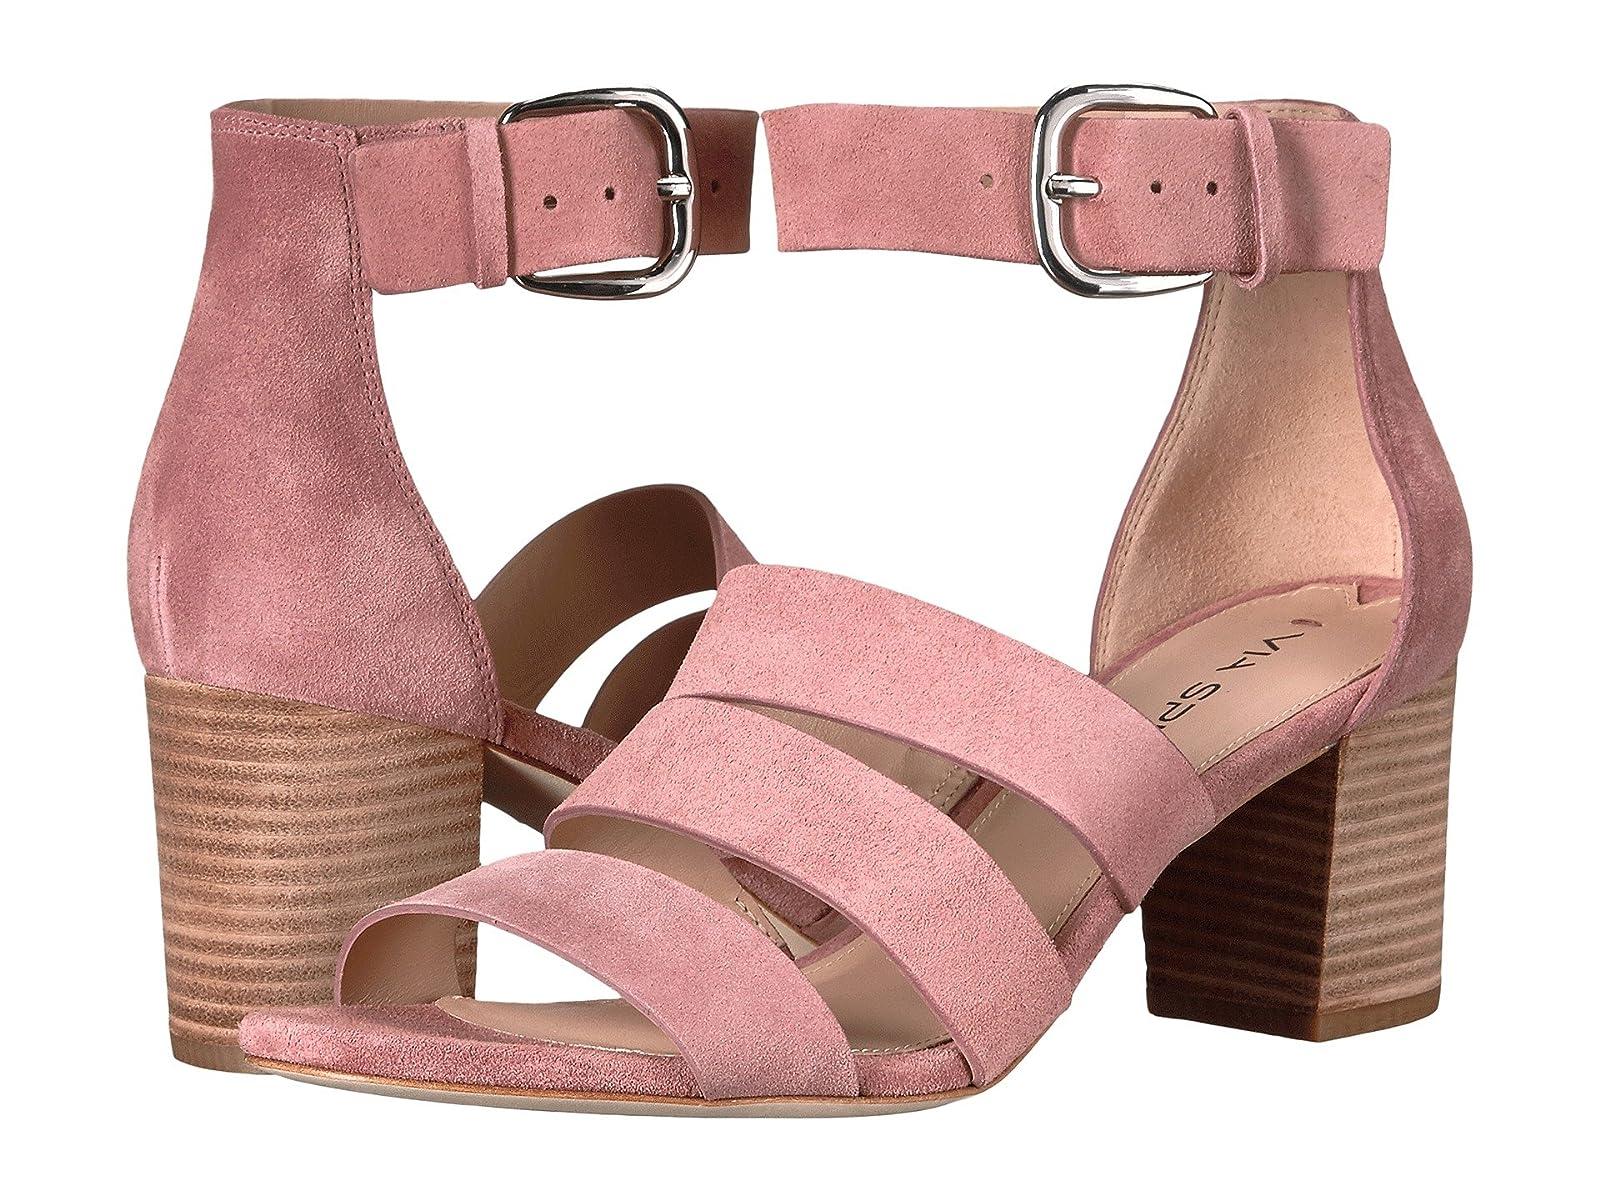 Via Spiga CarysCheap and distinctive eye-catching shoes